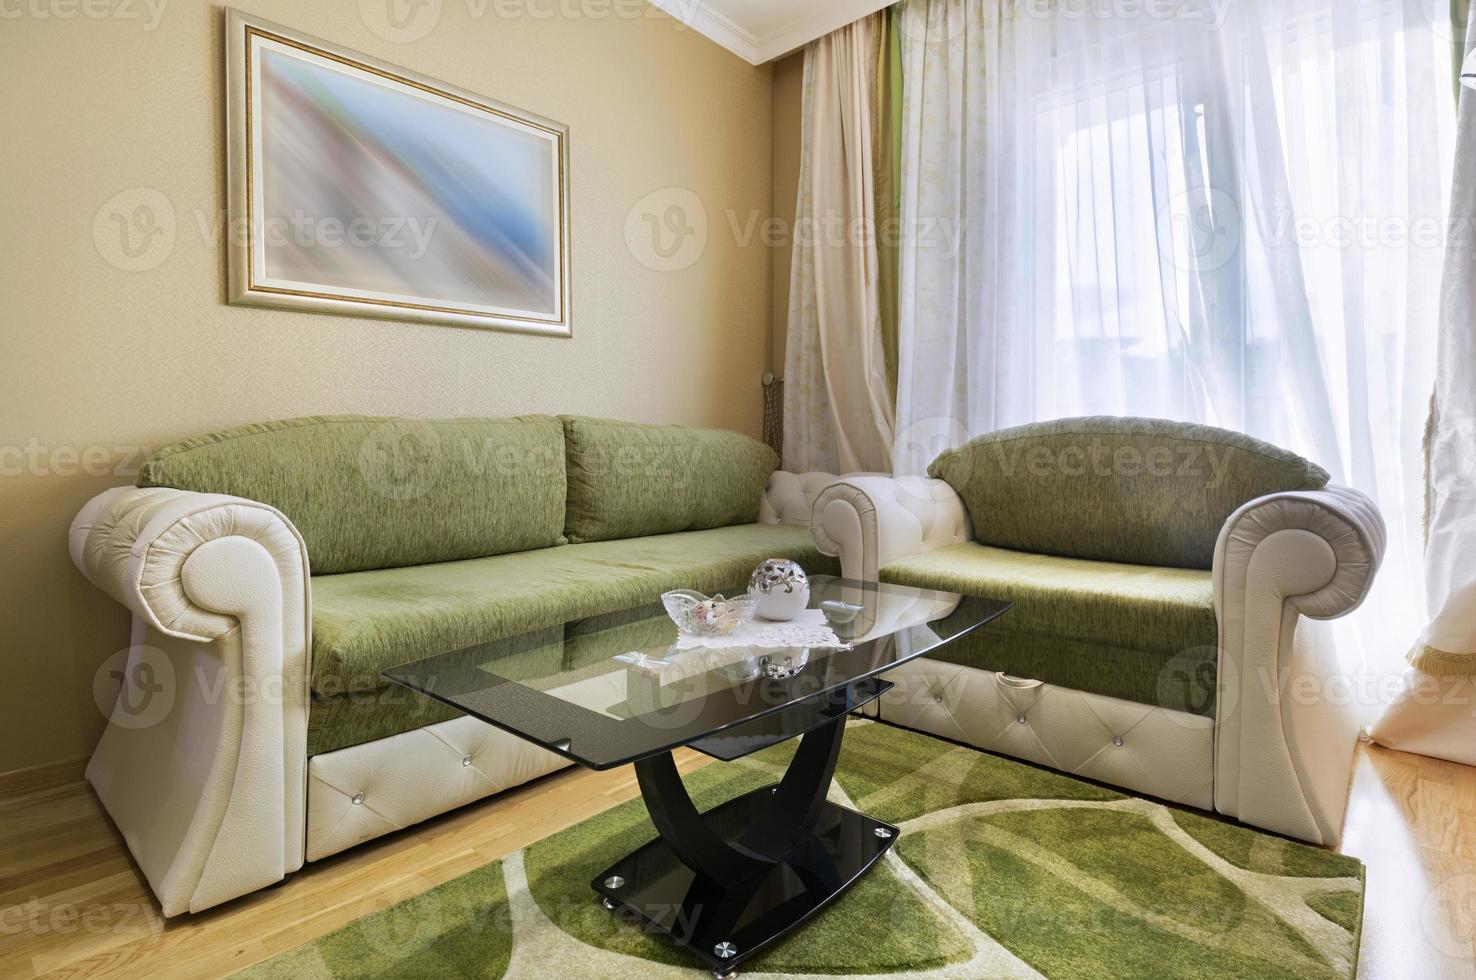 elegante sala de estar interior foto